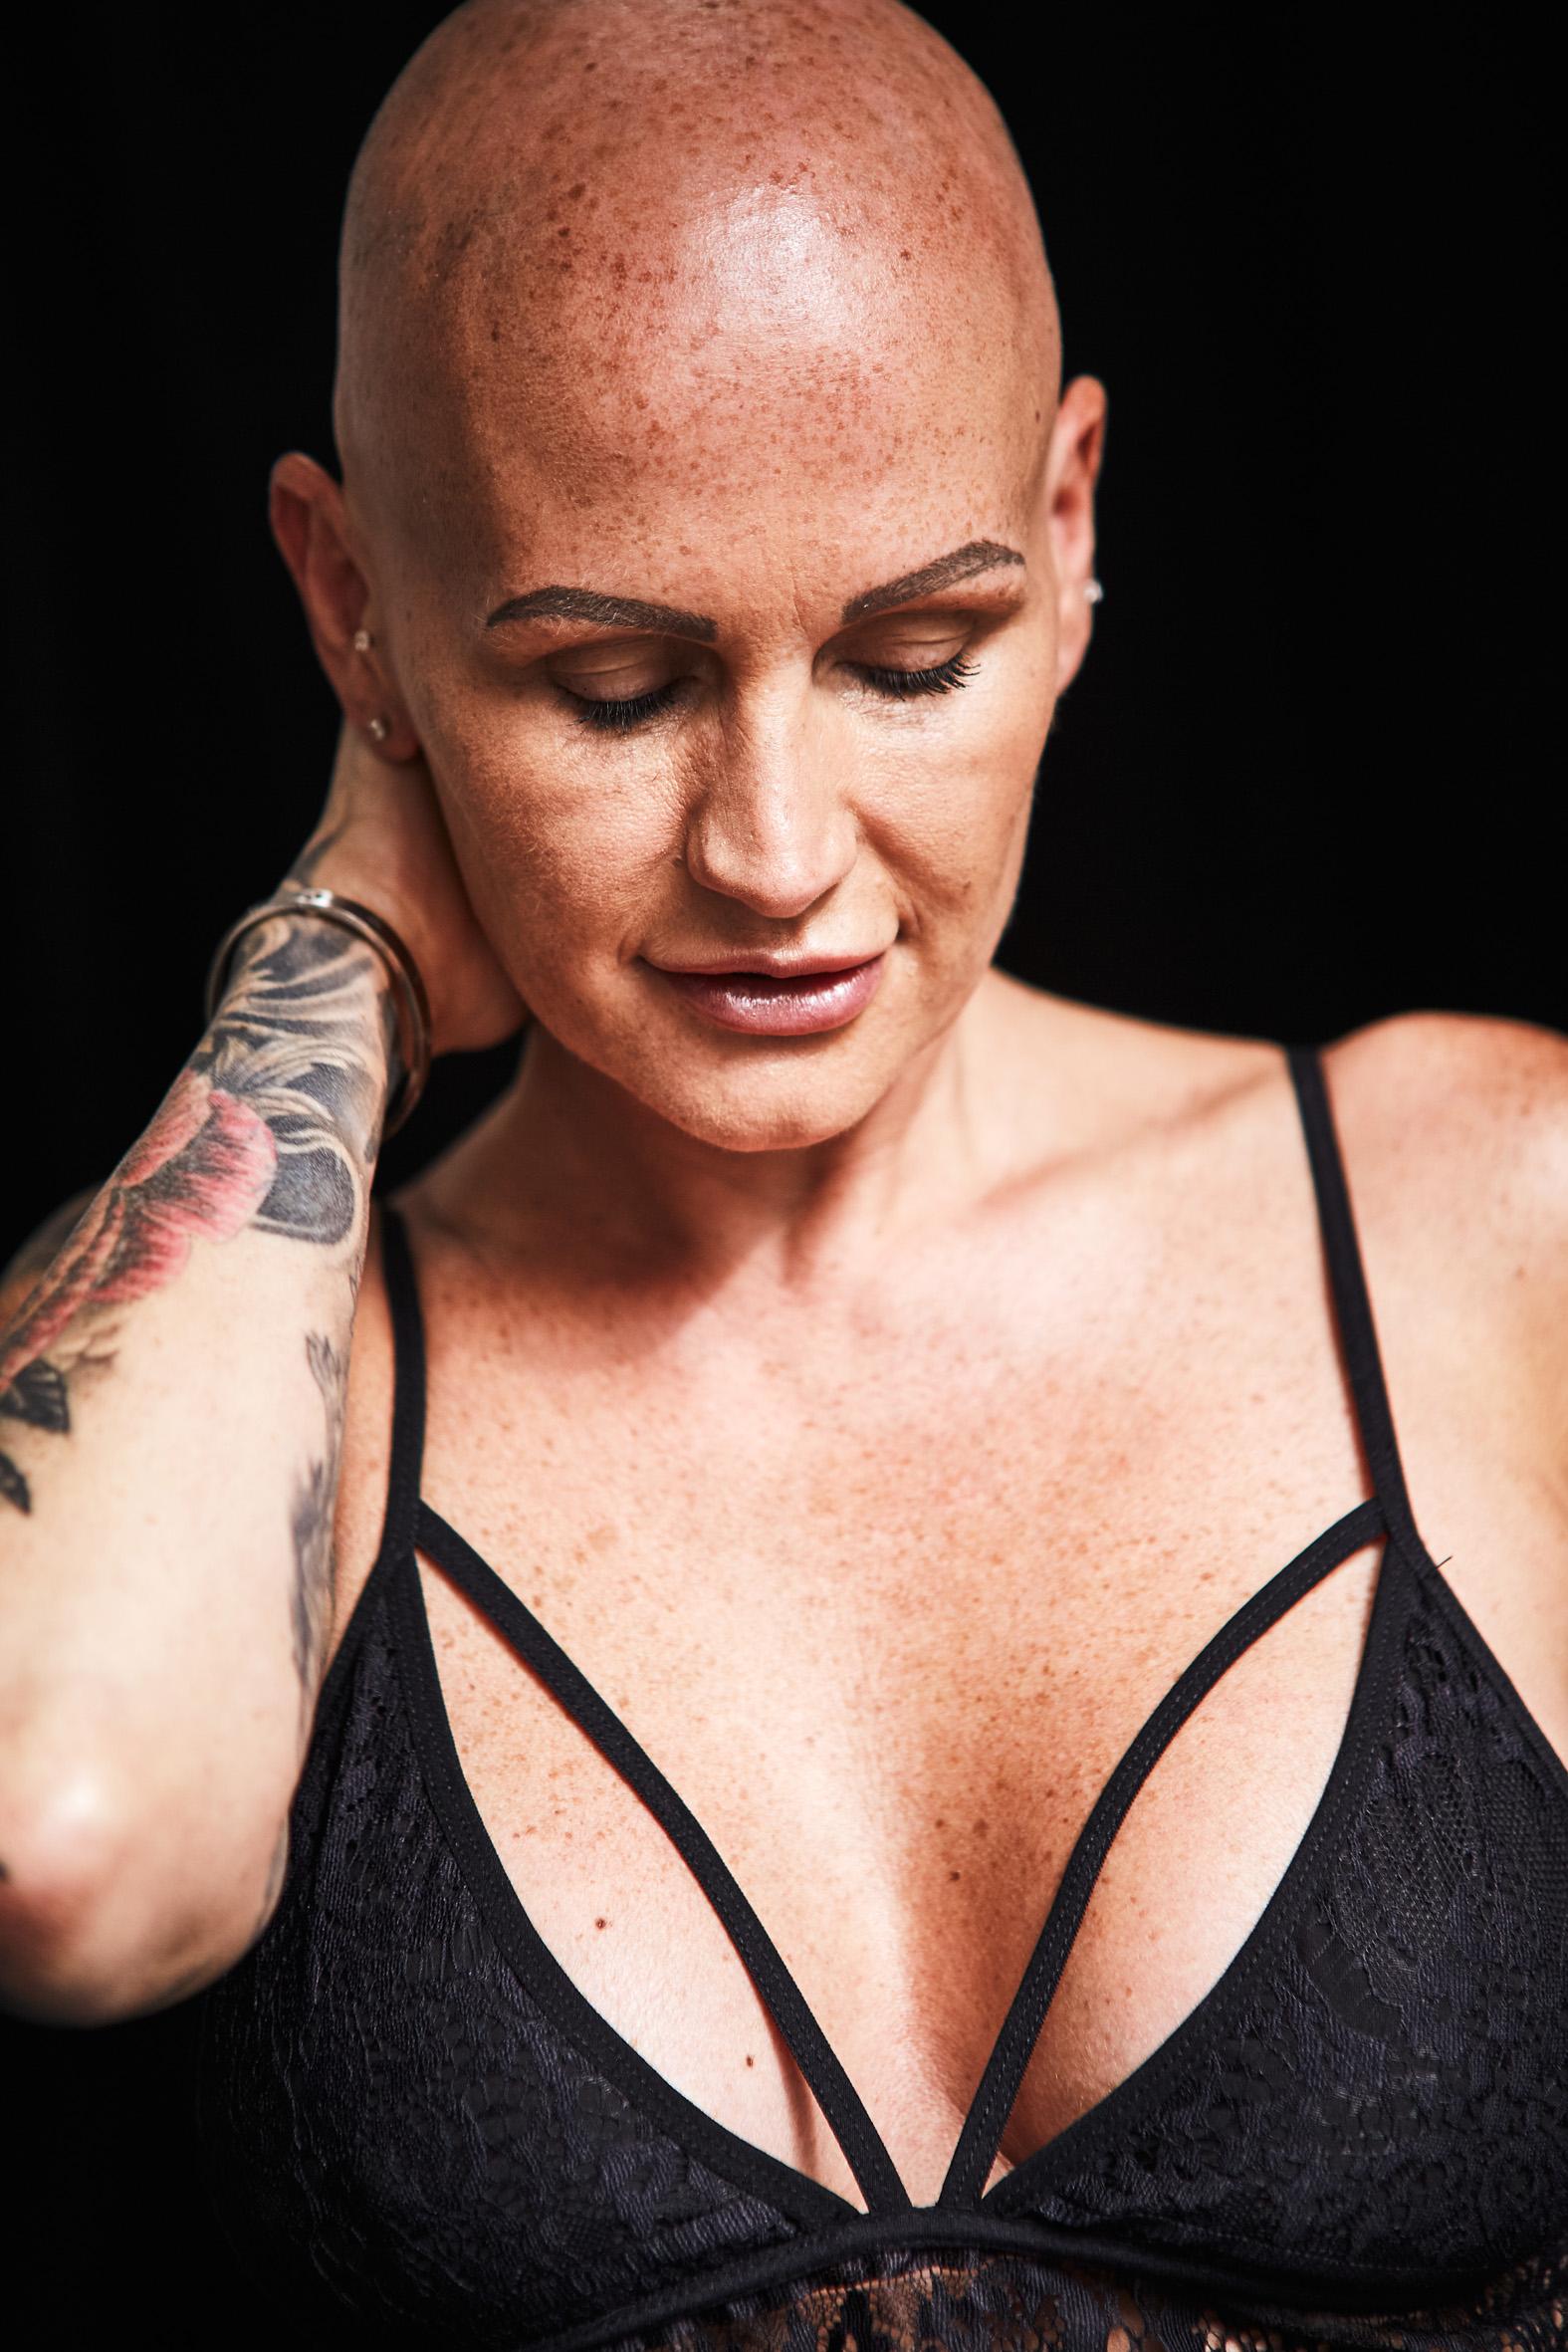 Victoria, Alopecia Universalis, Zebedee